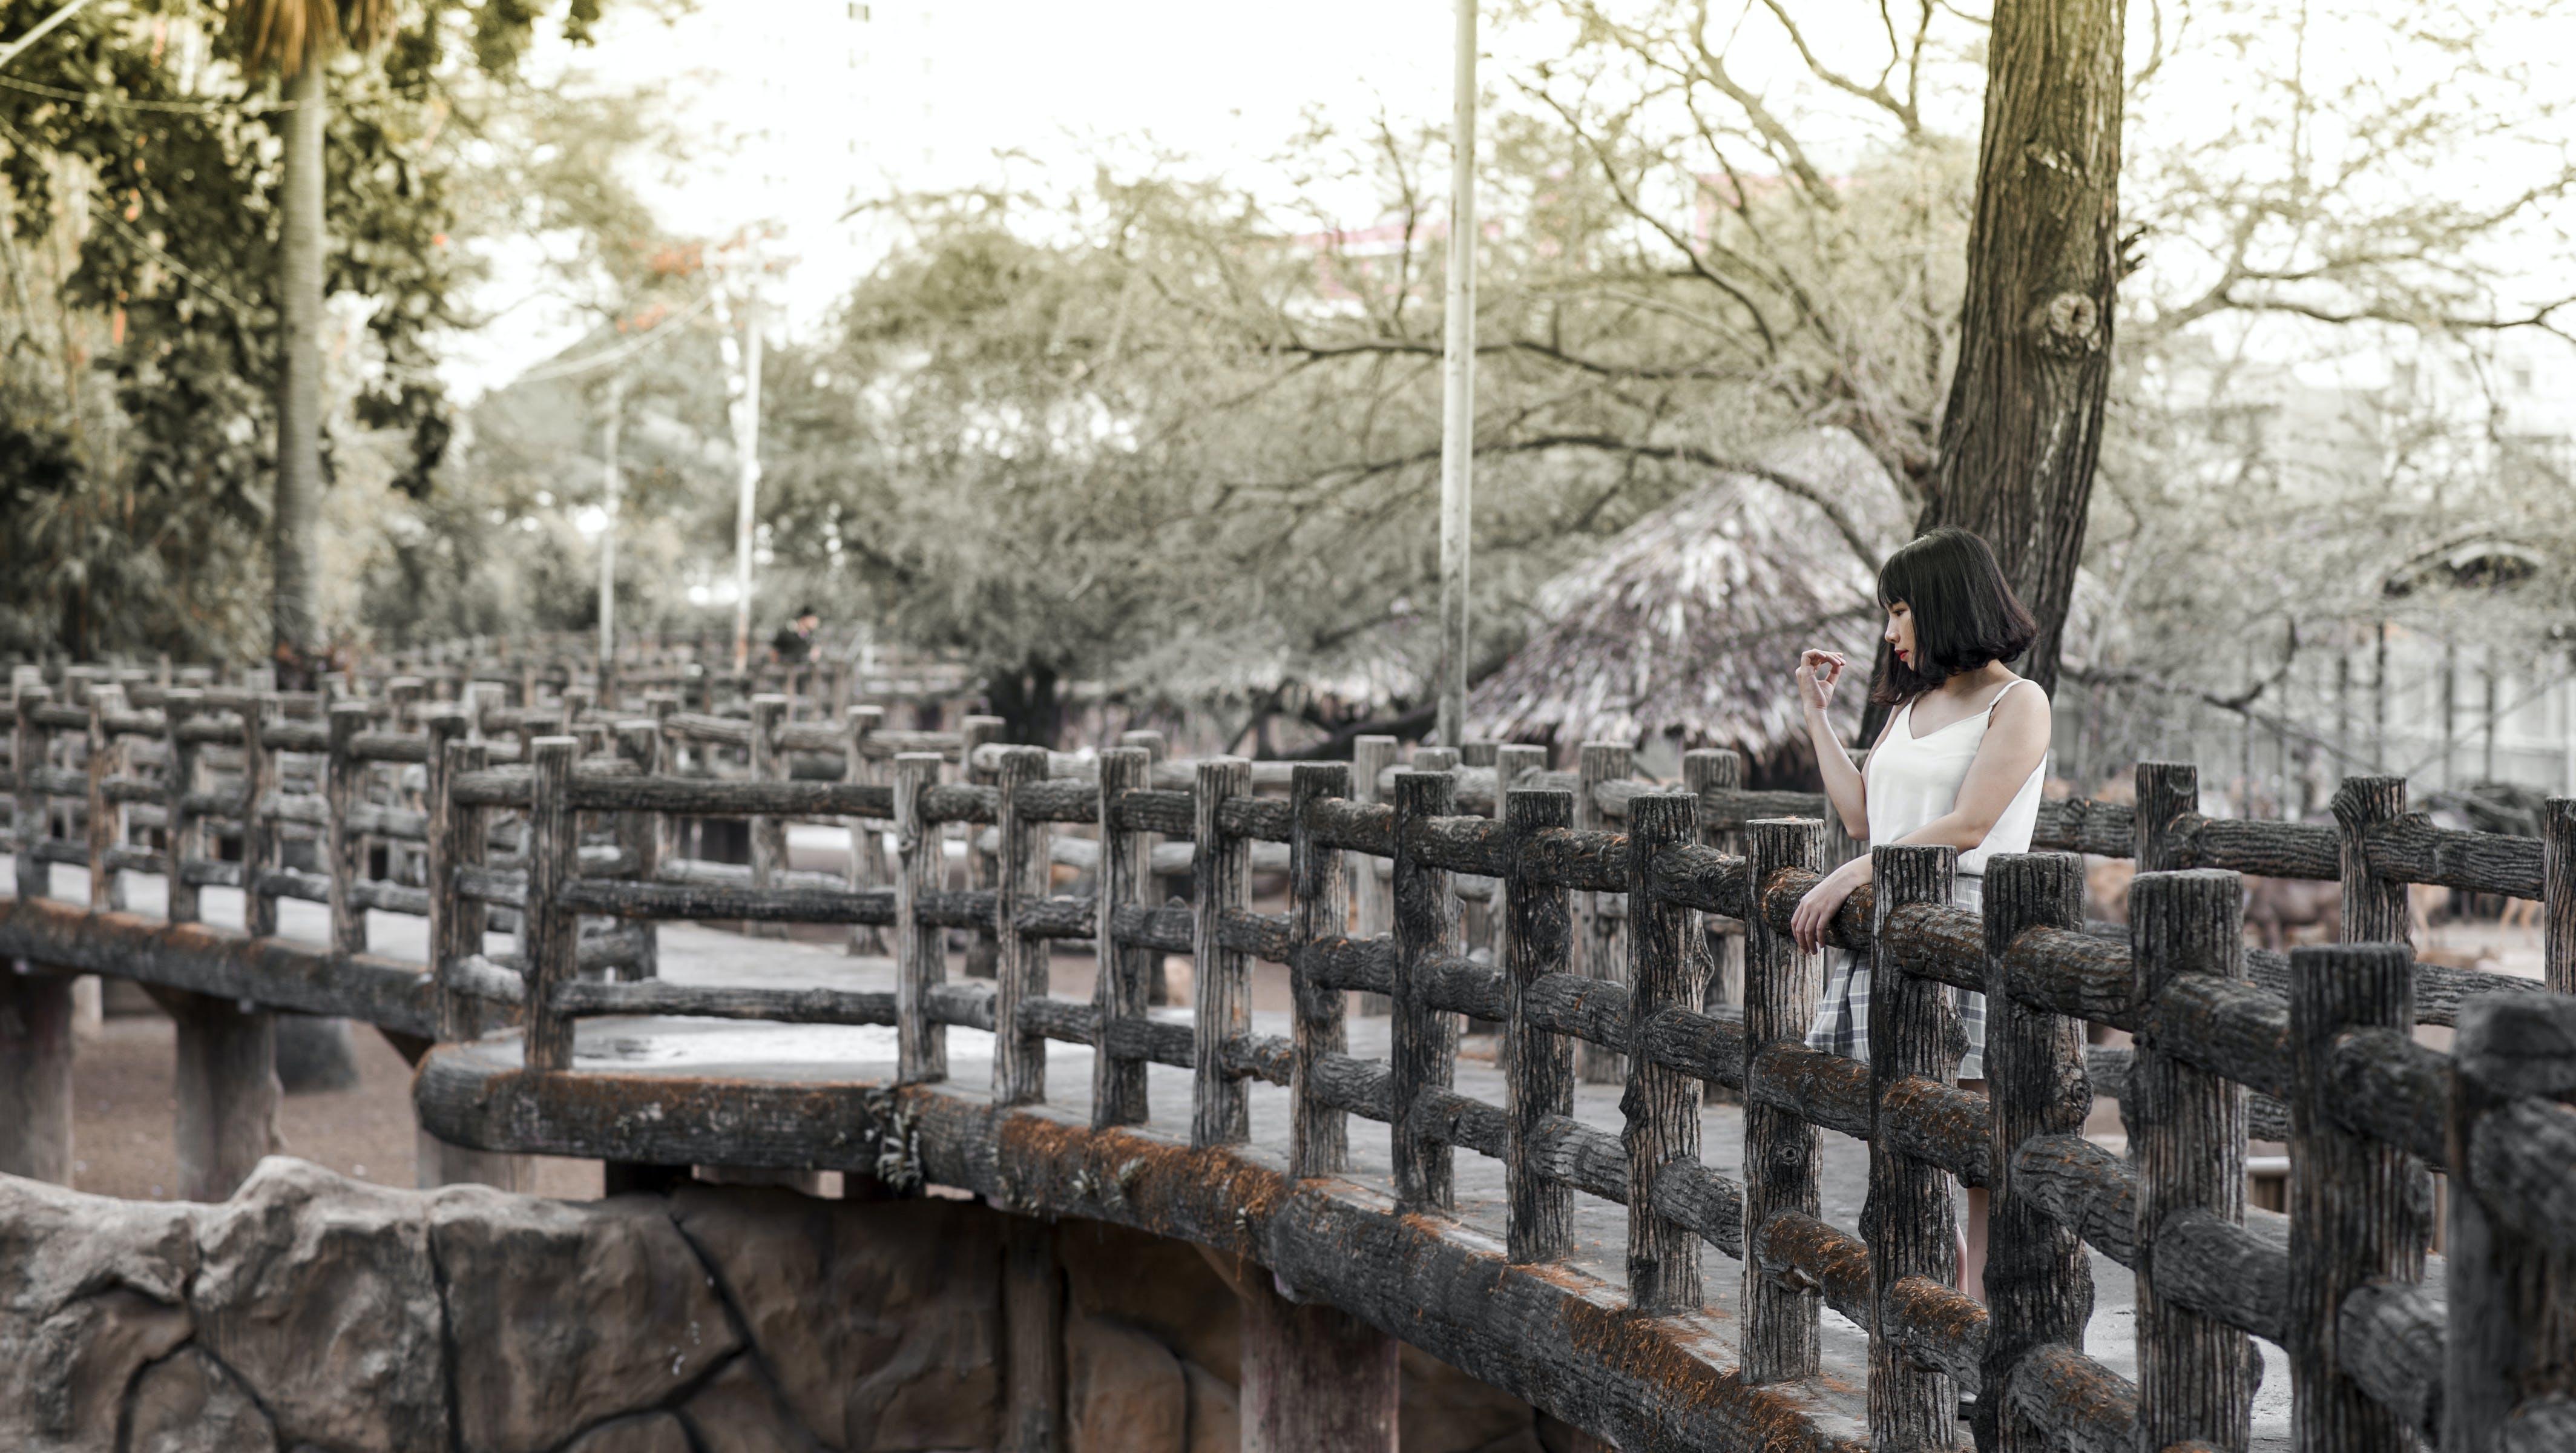 Woman in White Shirt Standing on Black Bridge